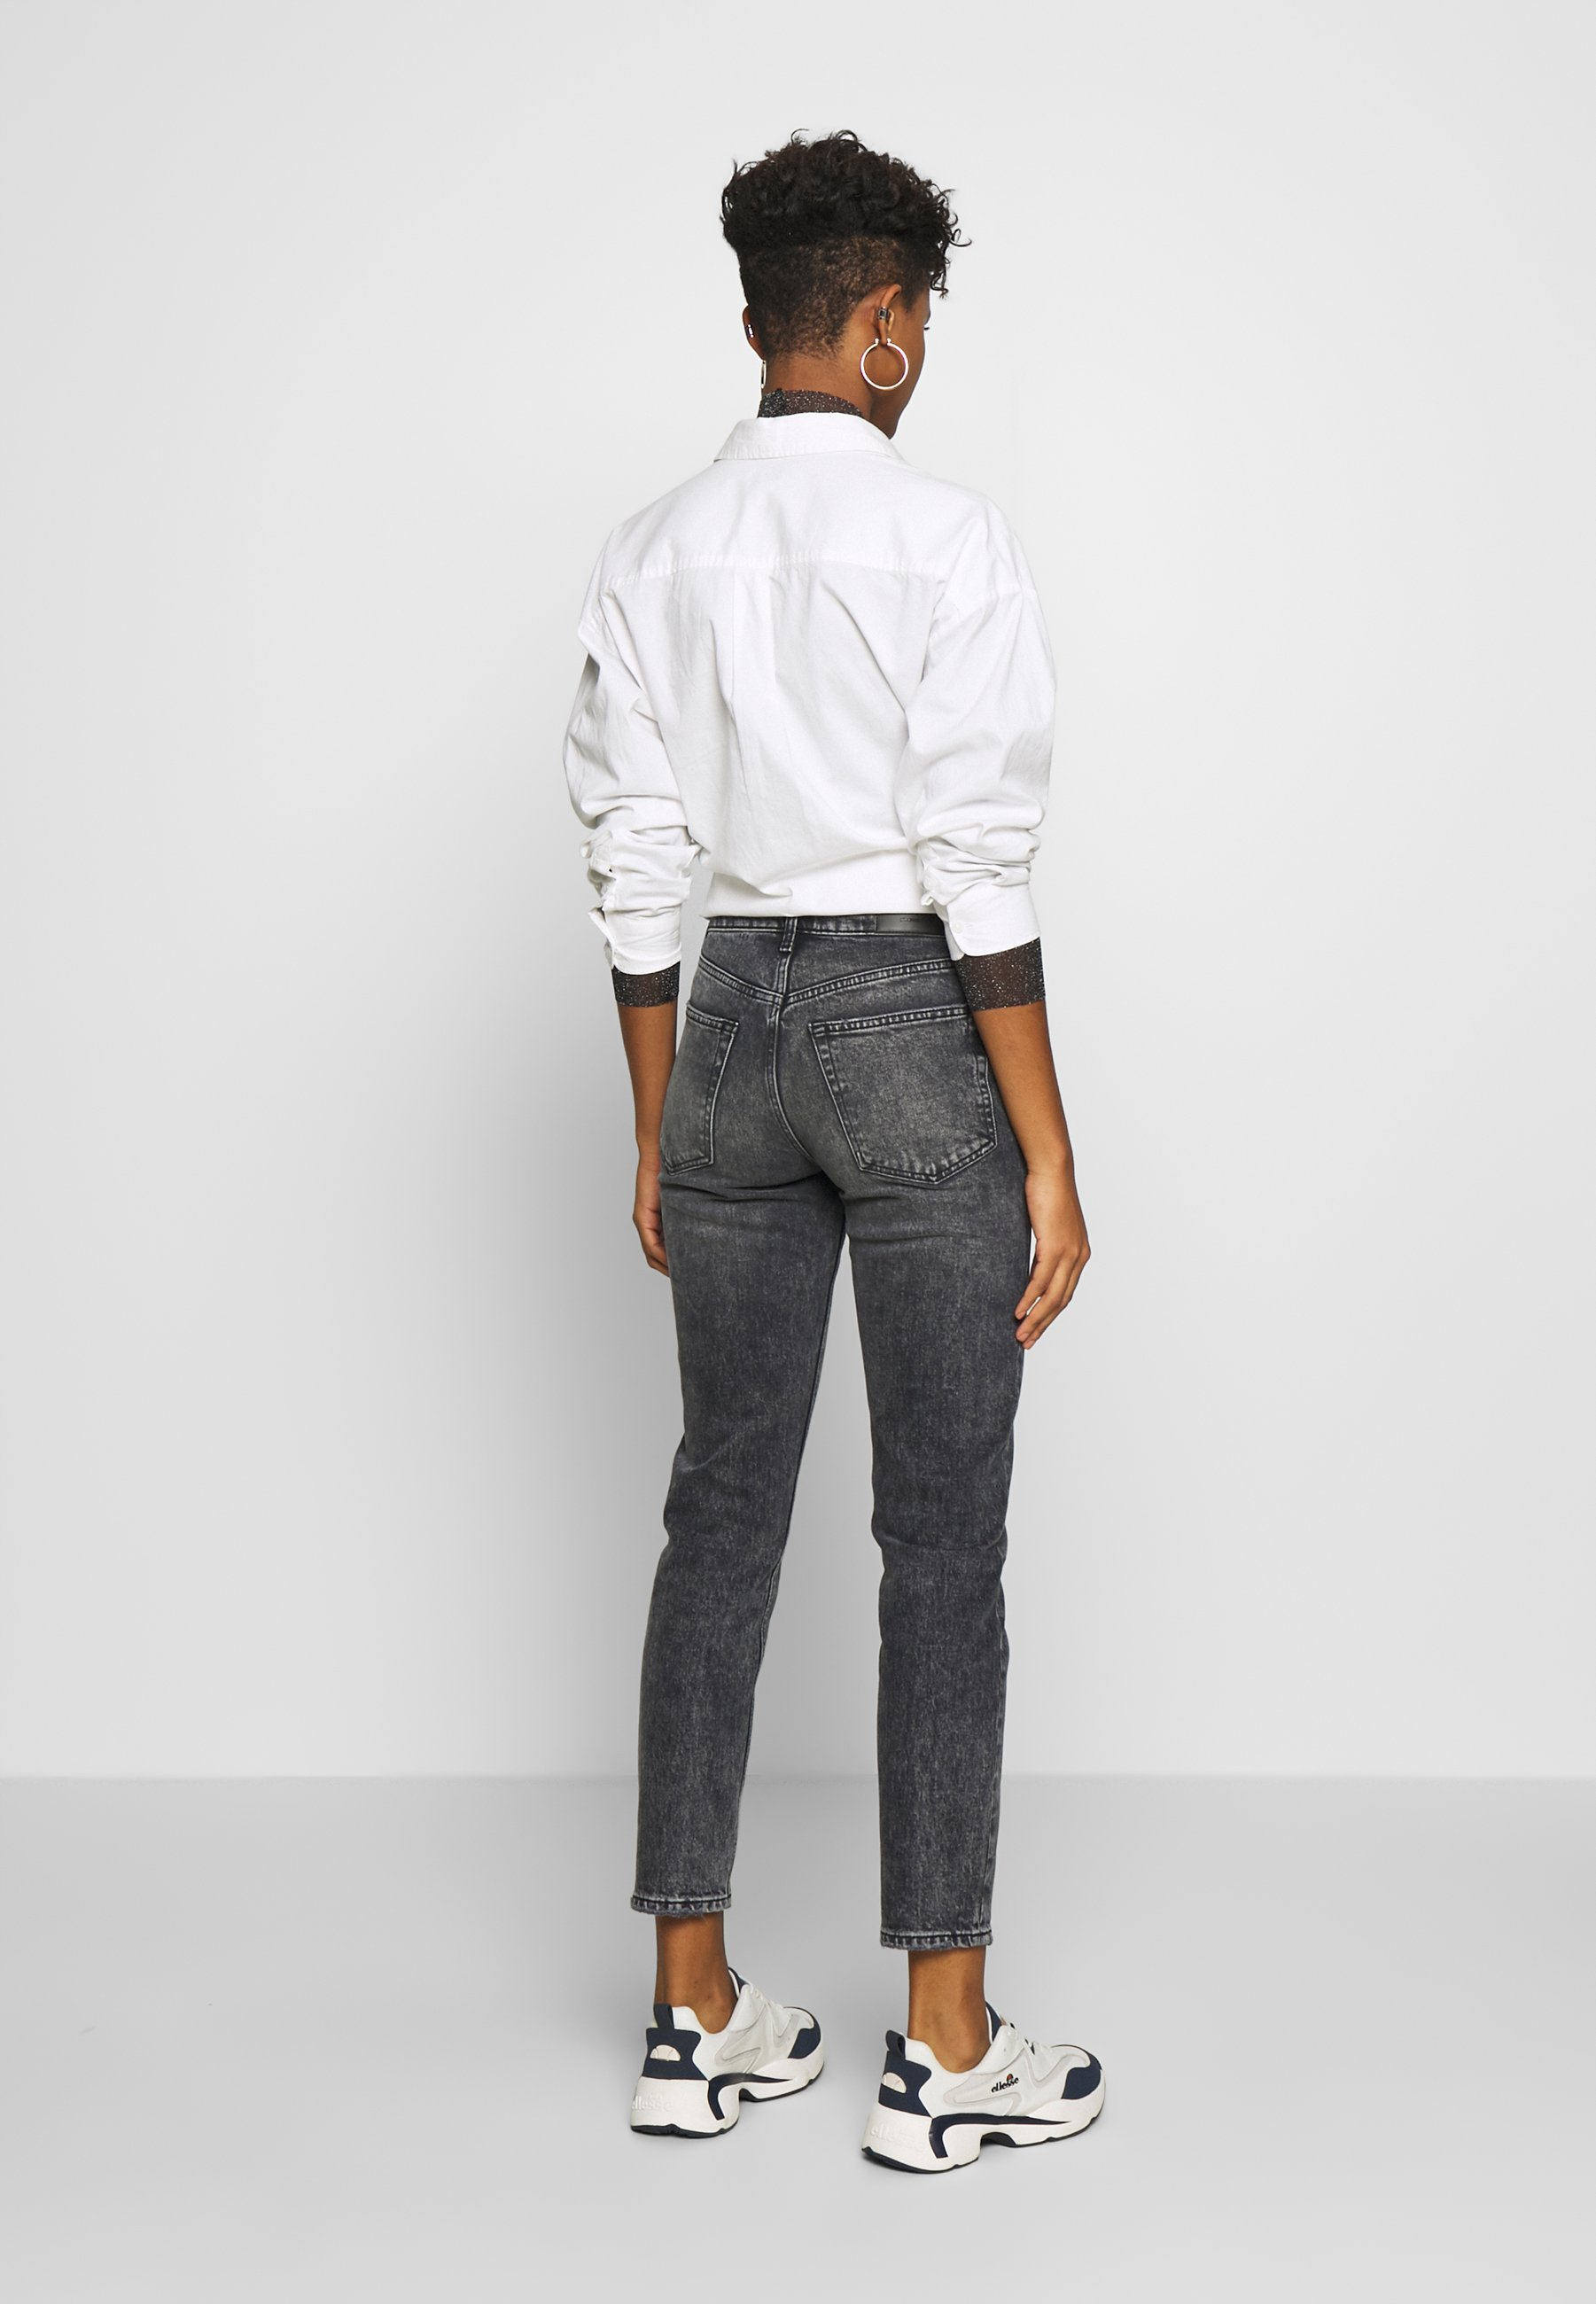 Gina Tricot TOVE ORIGINAL - Jean slim - black/grey - Jeans Femme PZnOy